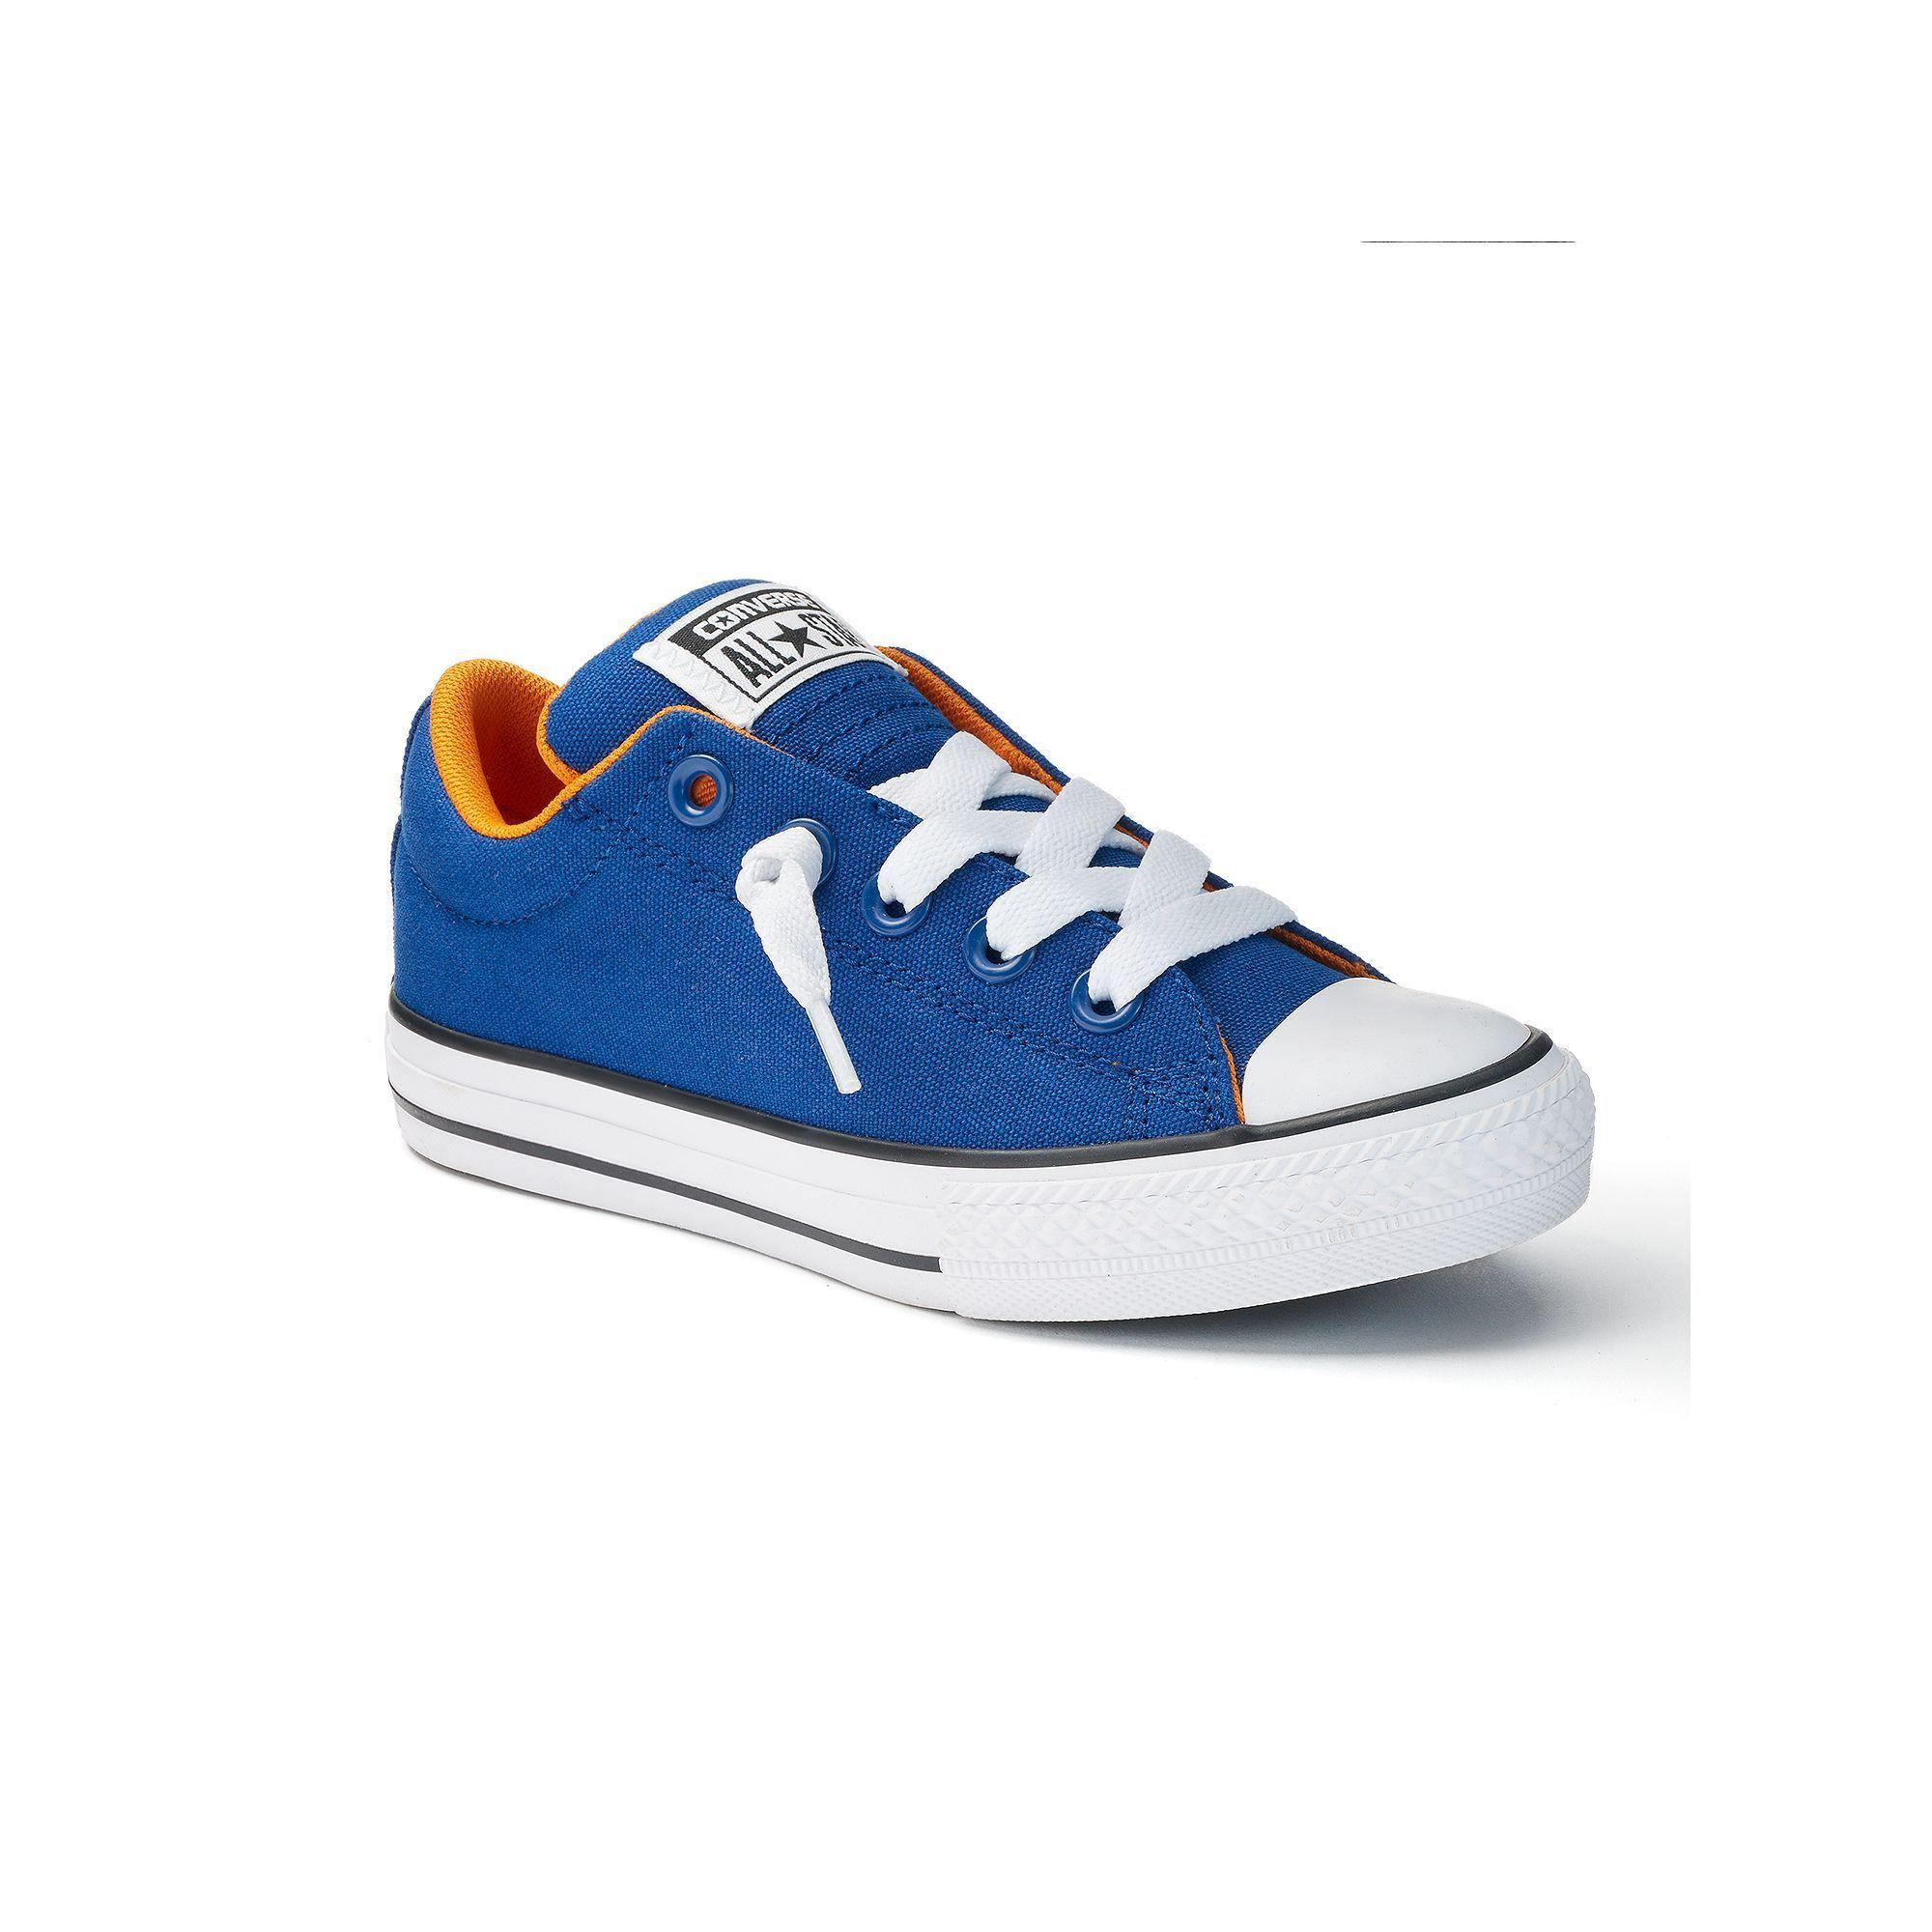 c8b1cb8879886 Kid s Converse Chuck Taylor All Star Street Slip Shoes